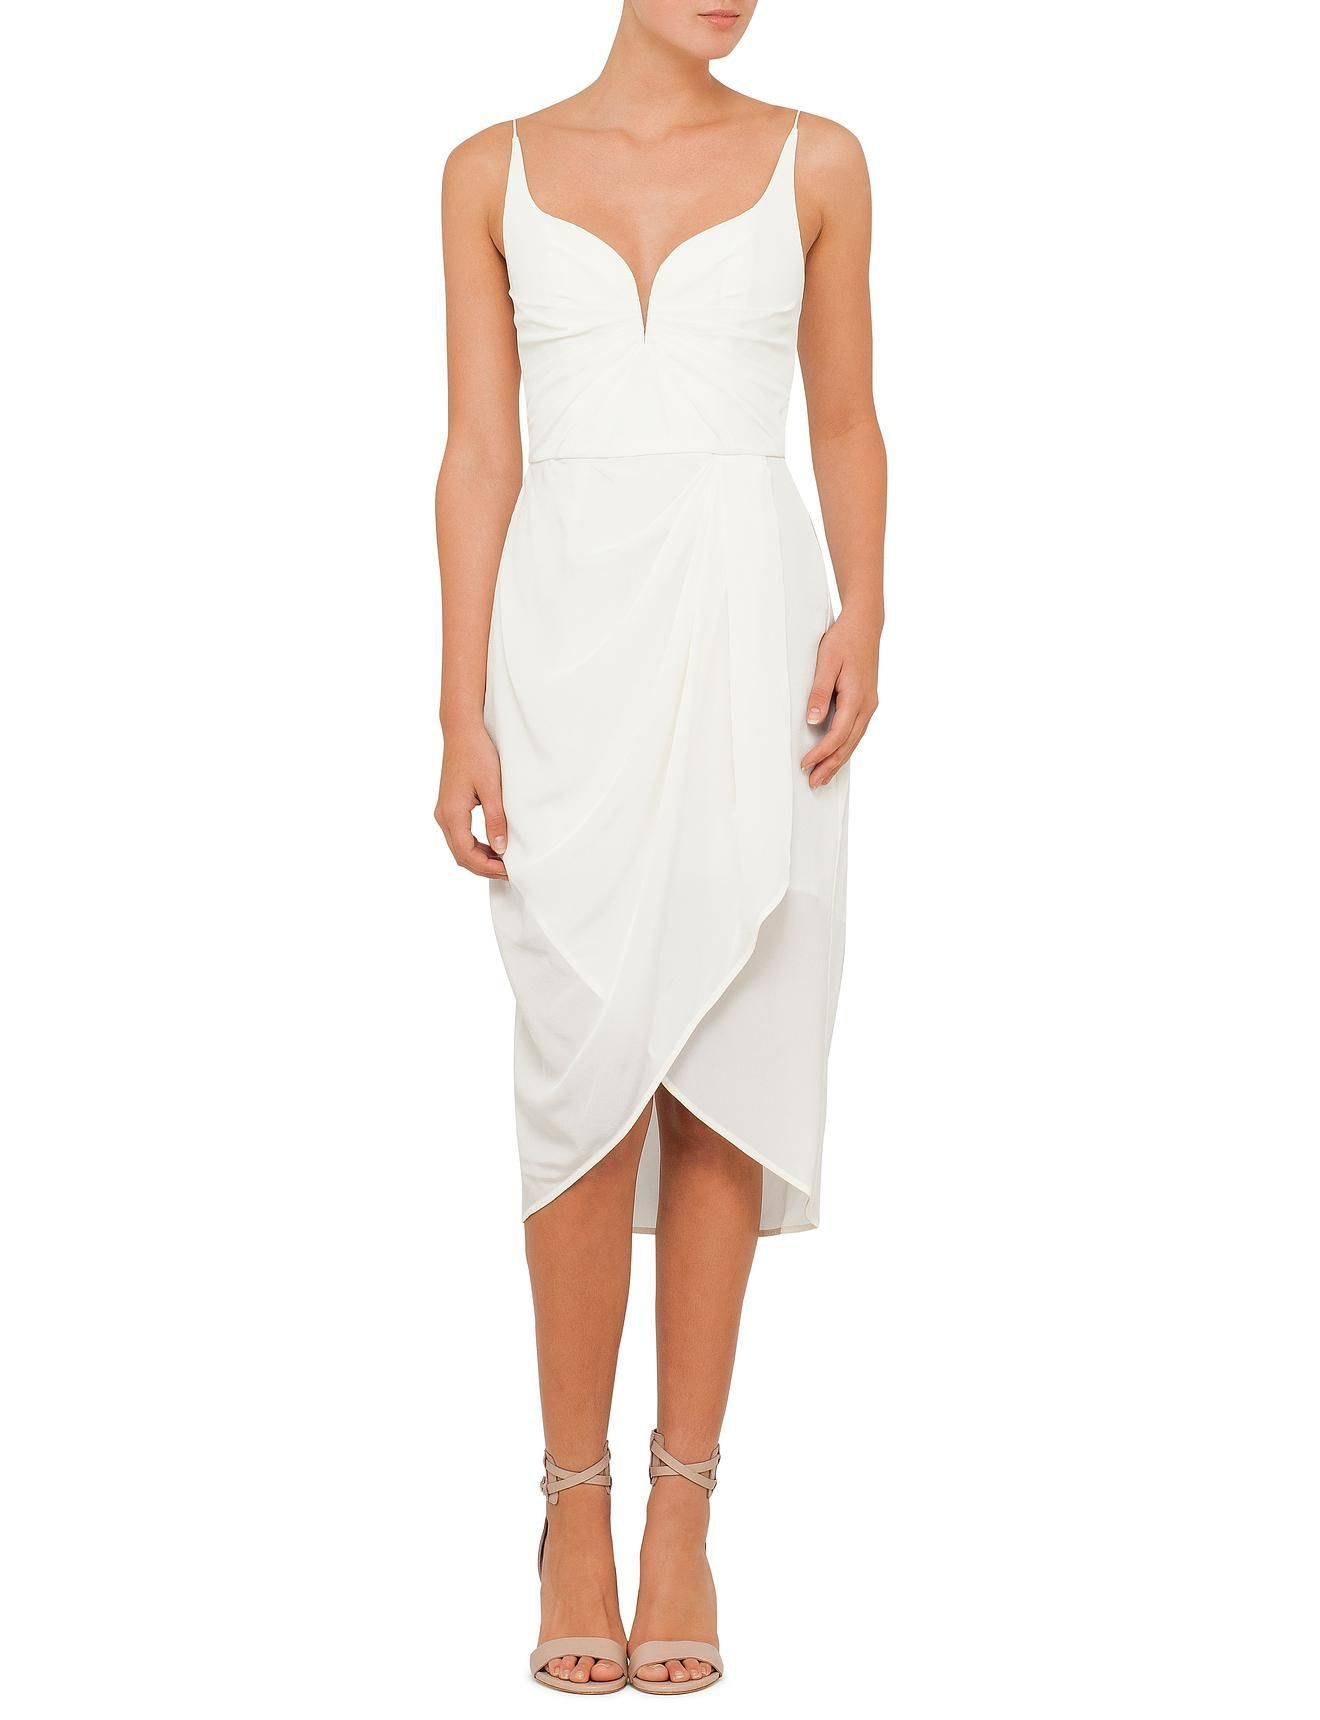 White dress david jones - Silk Drape Dress David Jones